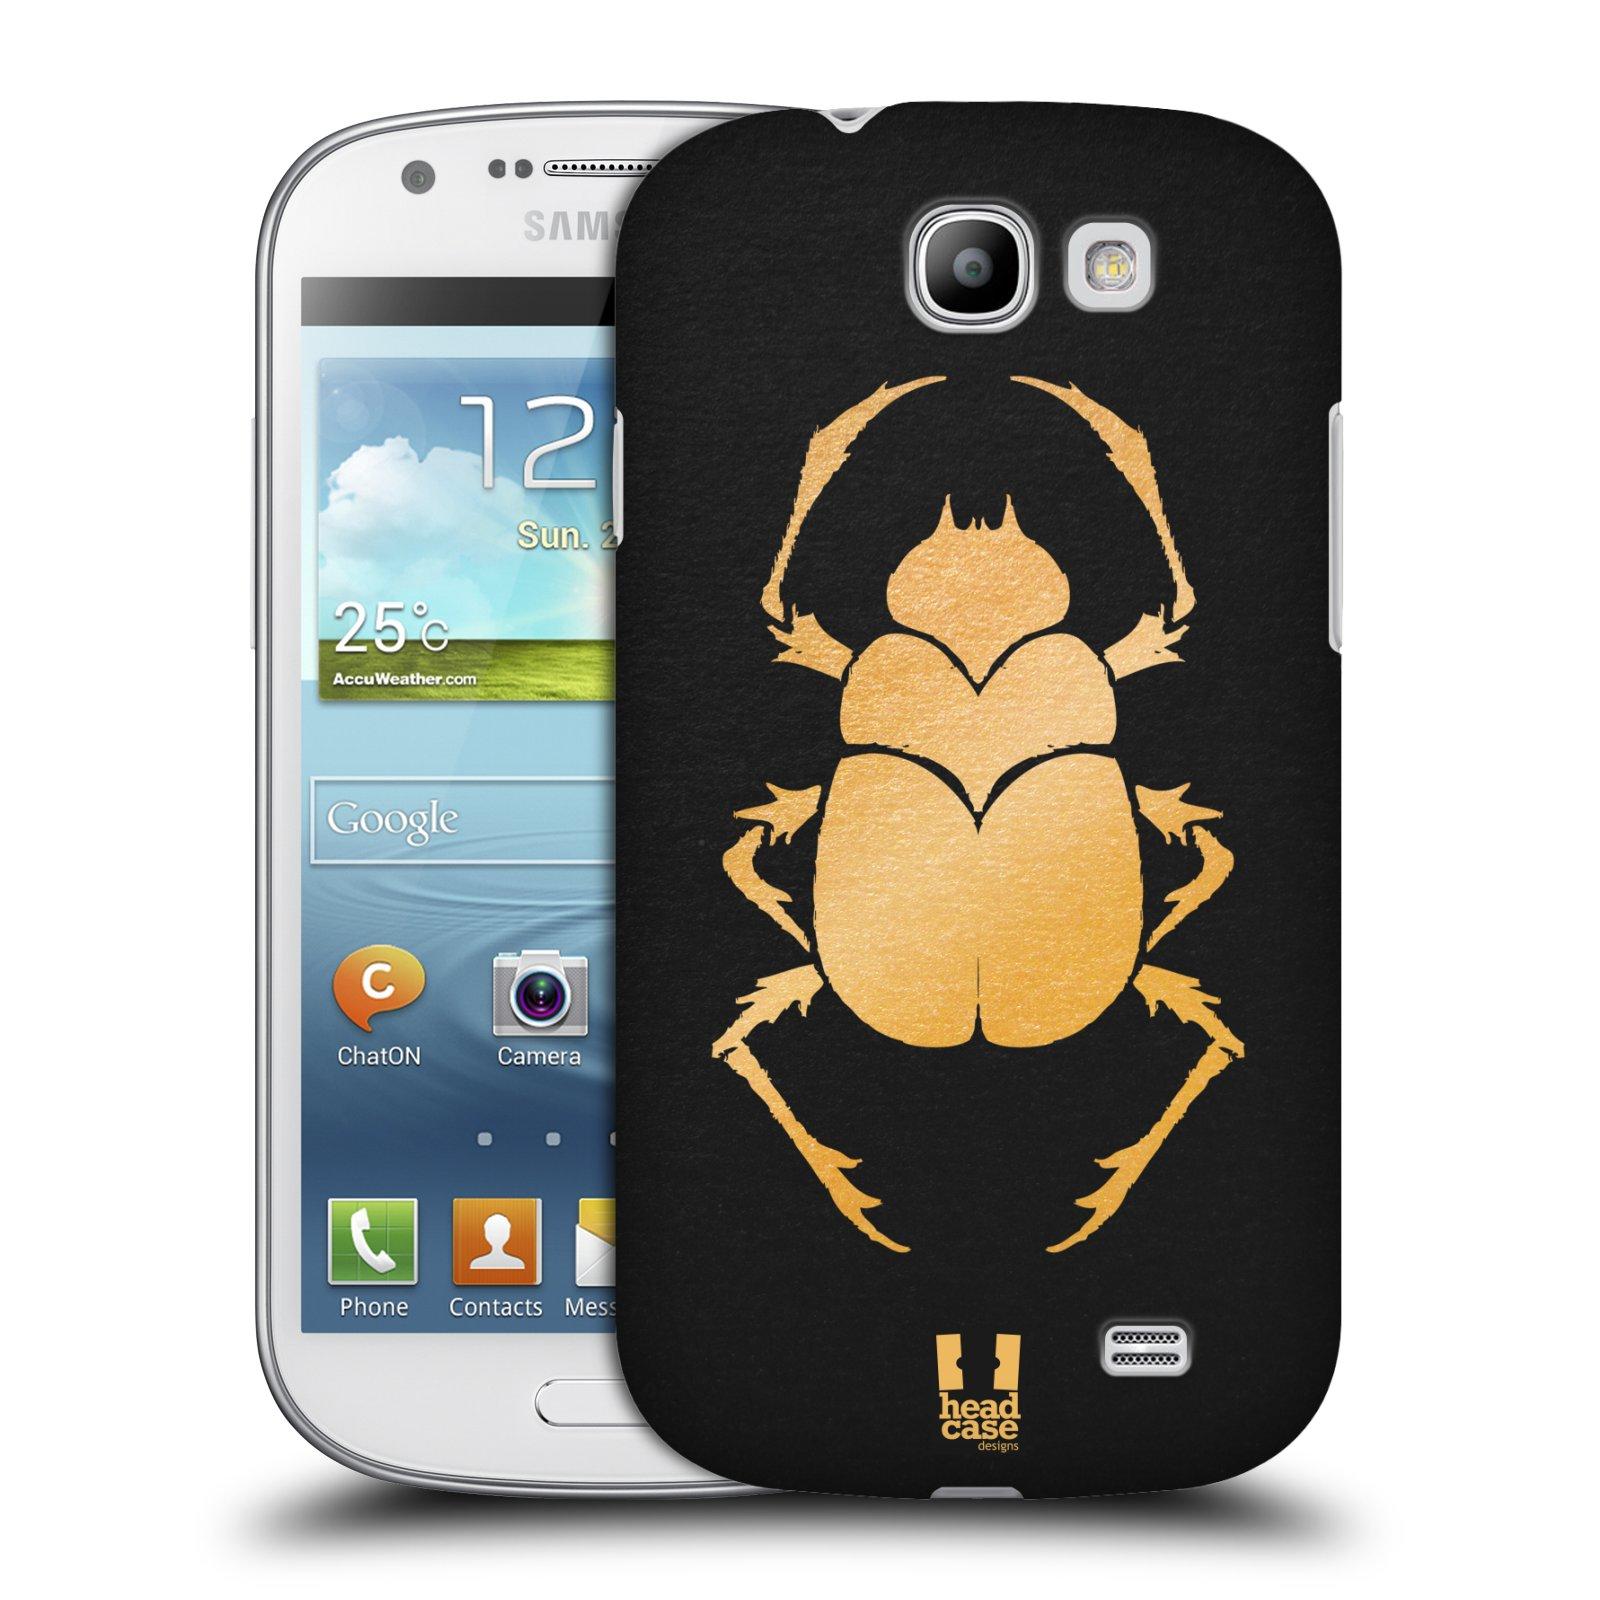 Plastové pouzdro na mobil Samsung Galaxy Express HEAD CASE EGYPT SCARABEUS (Kryt či obal na mobilní telefon Samsung Galaxy Express GT-i8730)